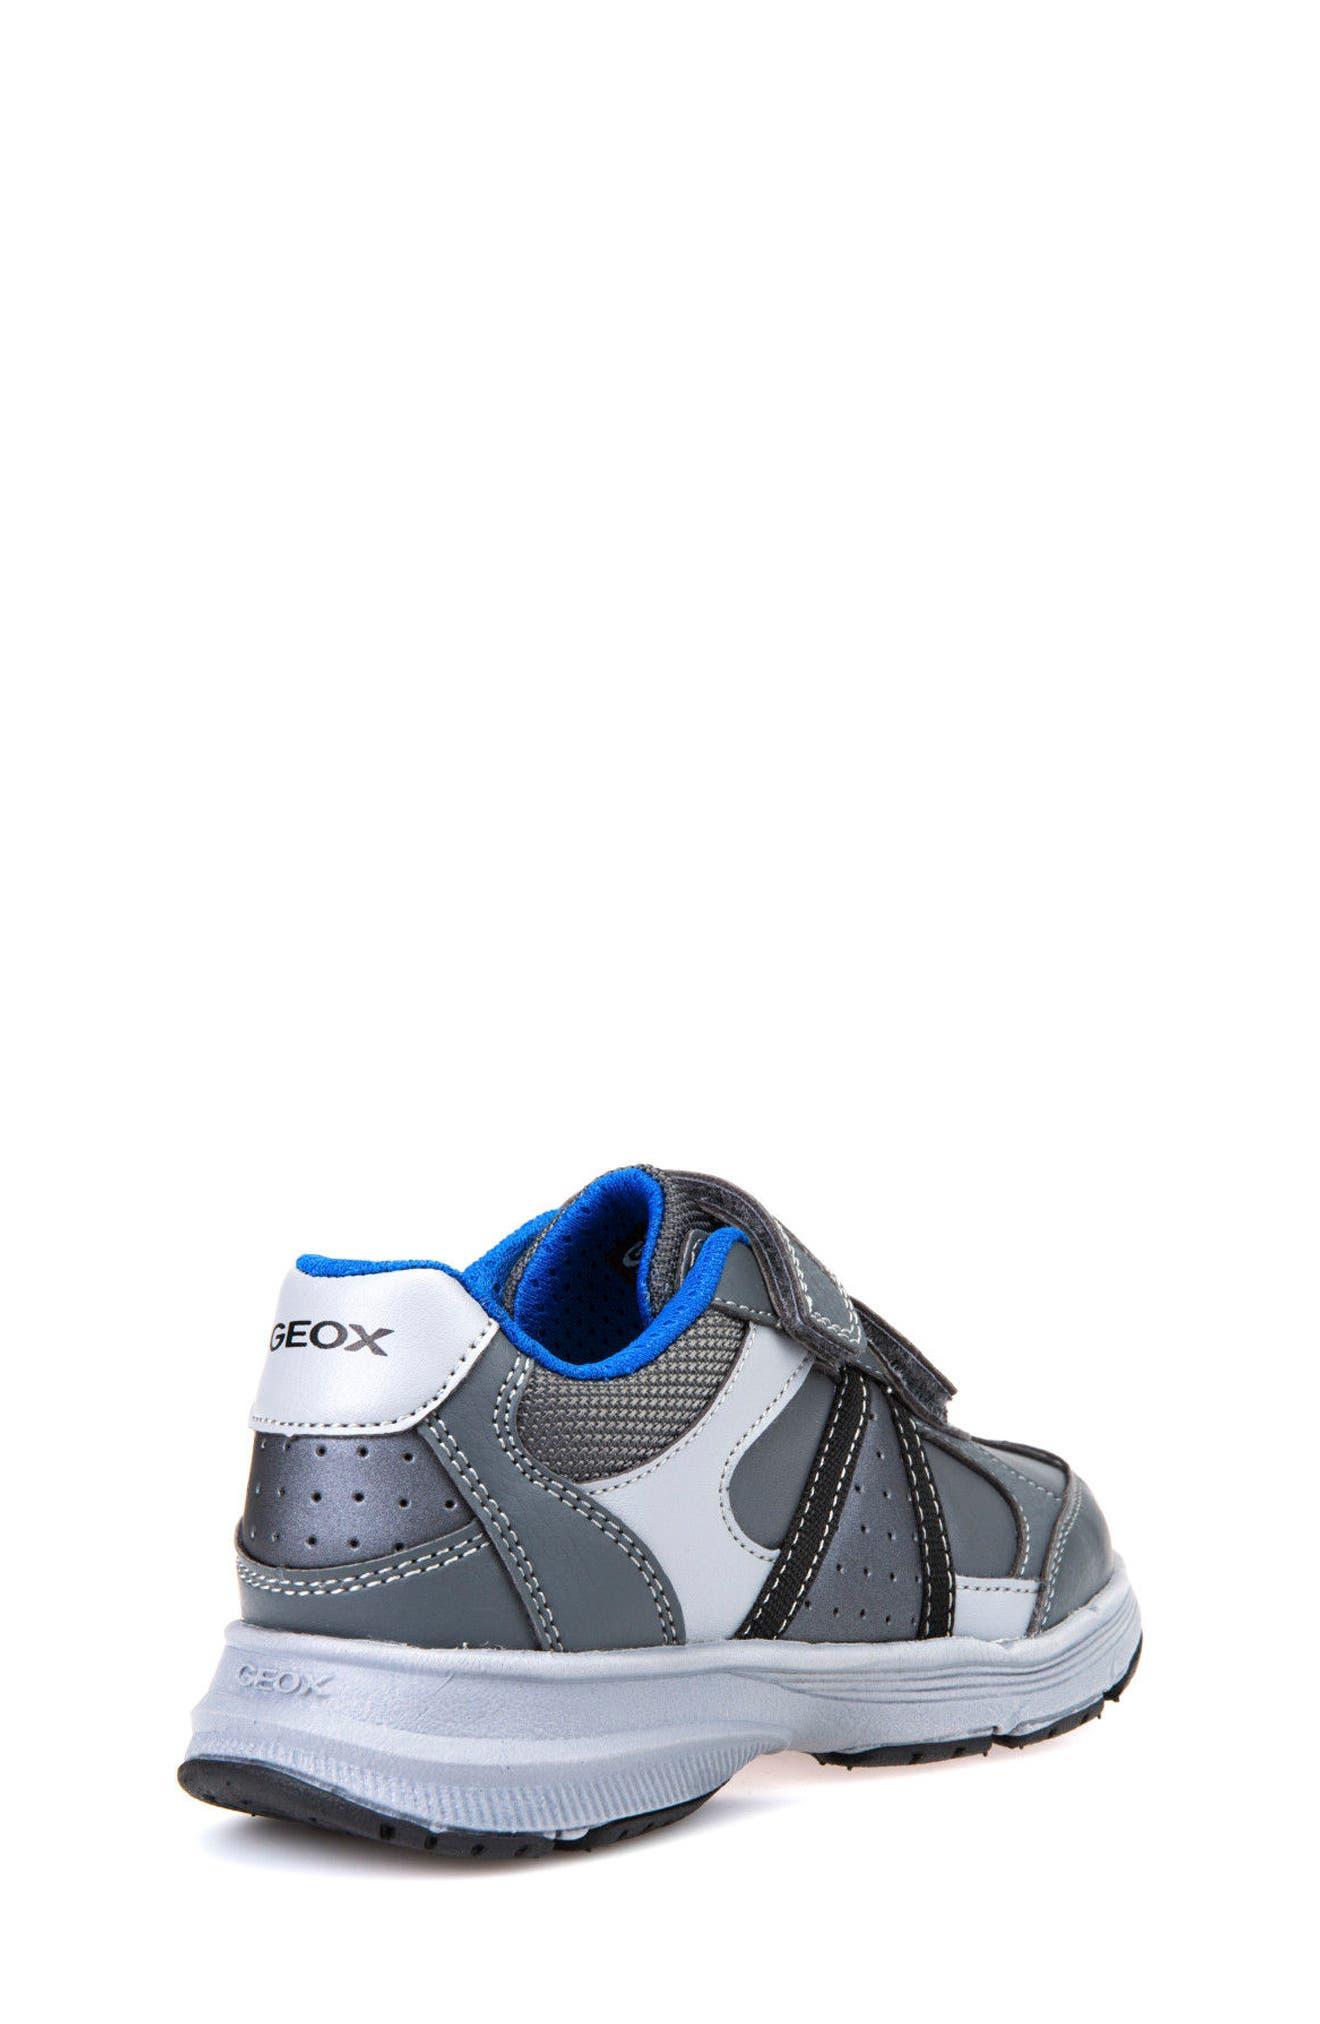 Top Fly Sneaker,                             Alternate thumbnail 2, color,                             020